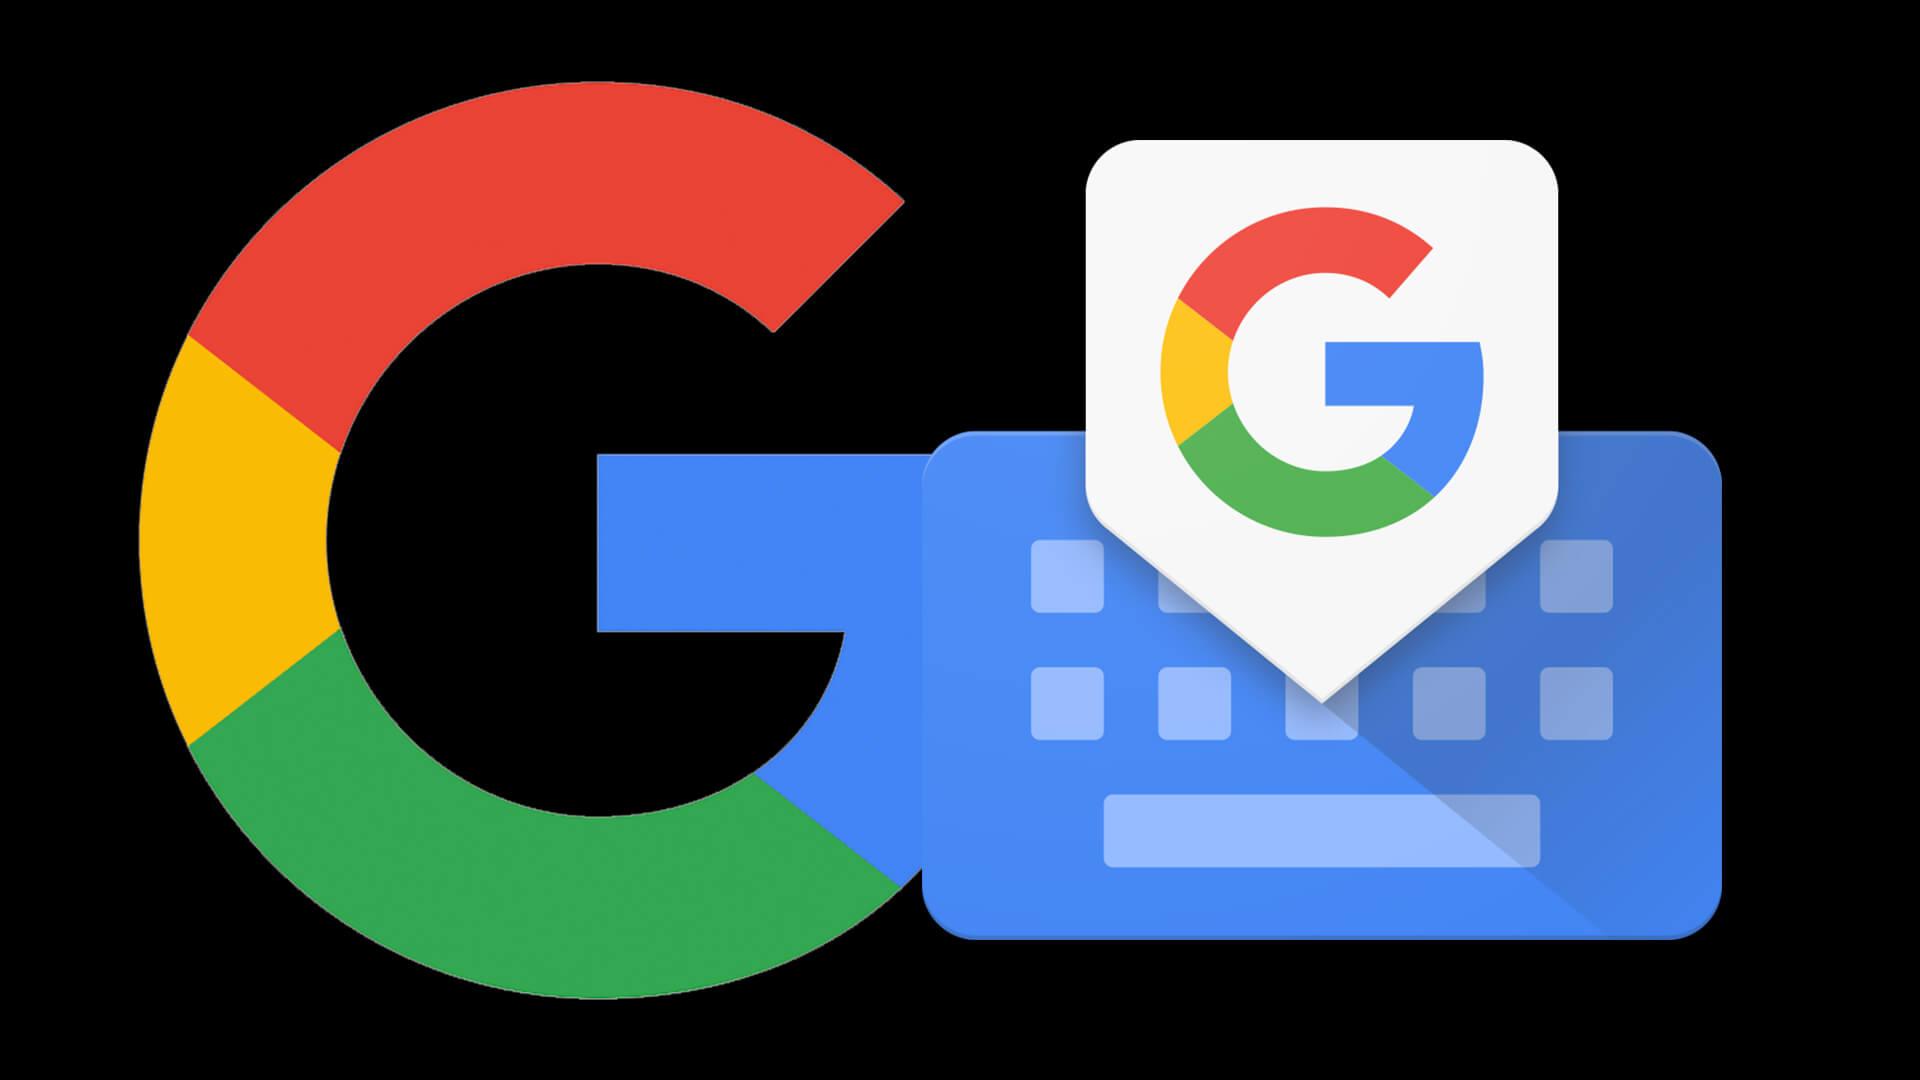 google-gboard4-1920